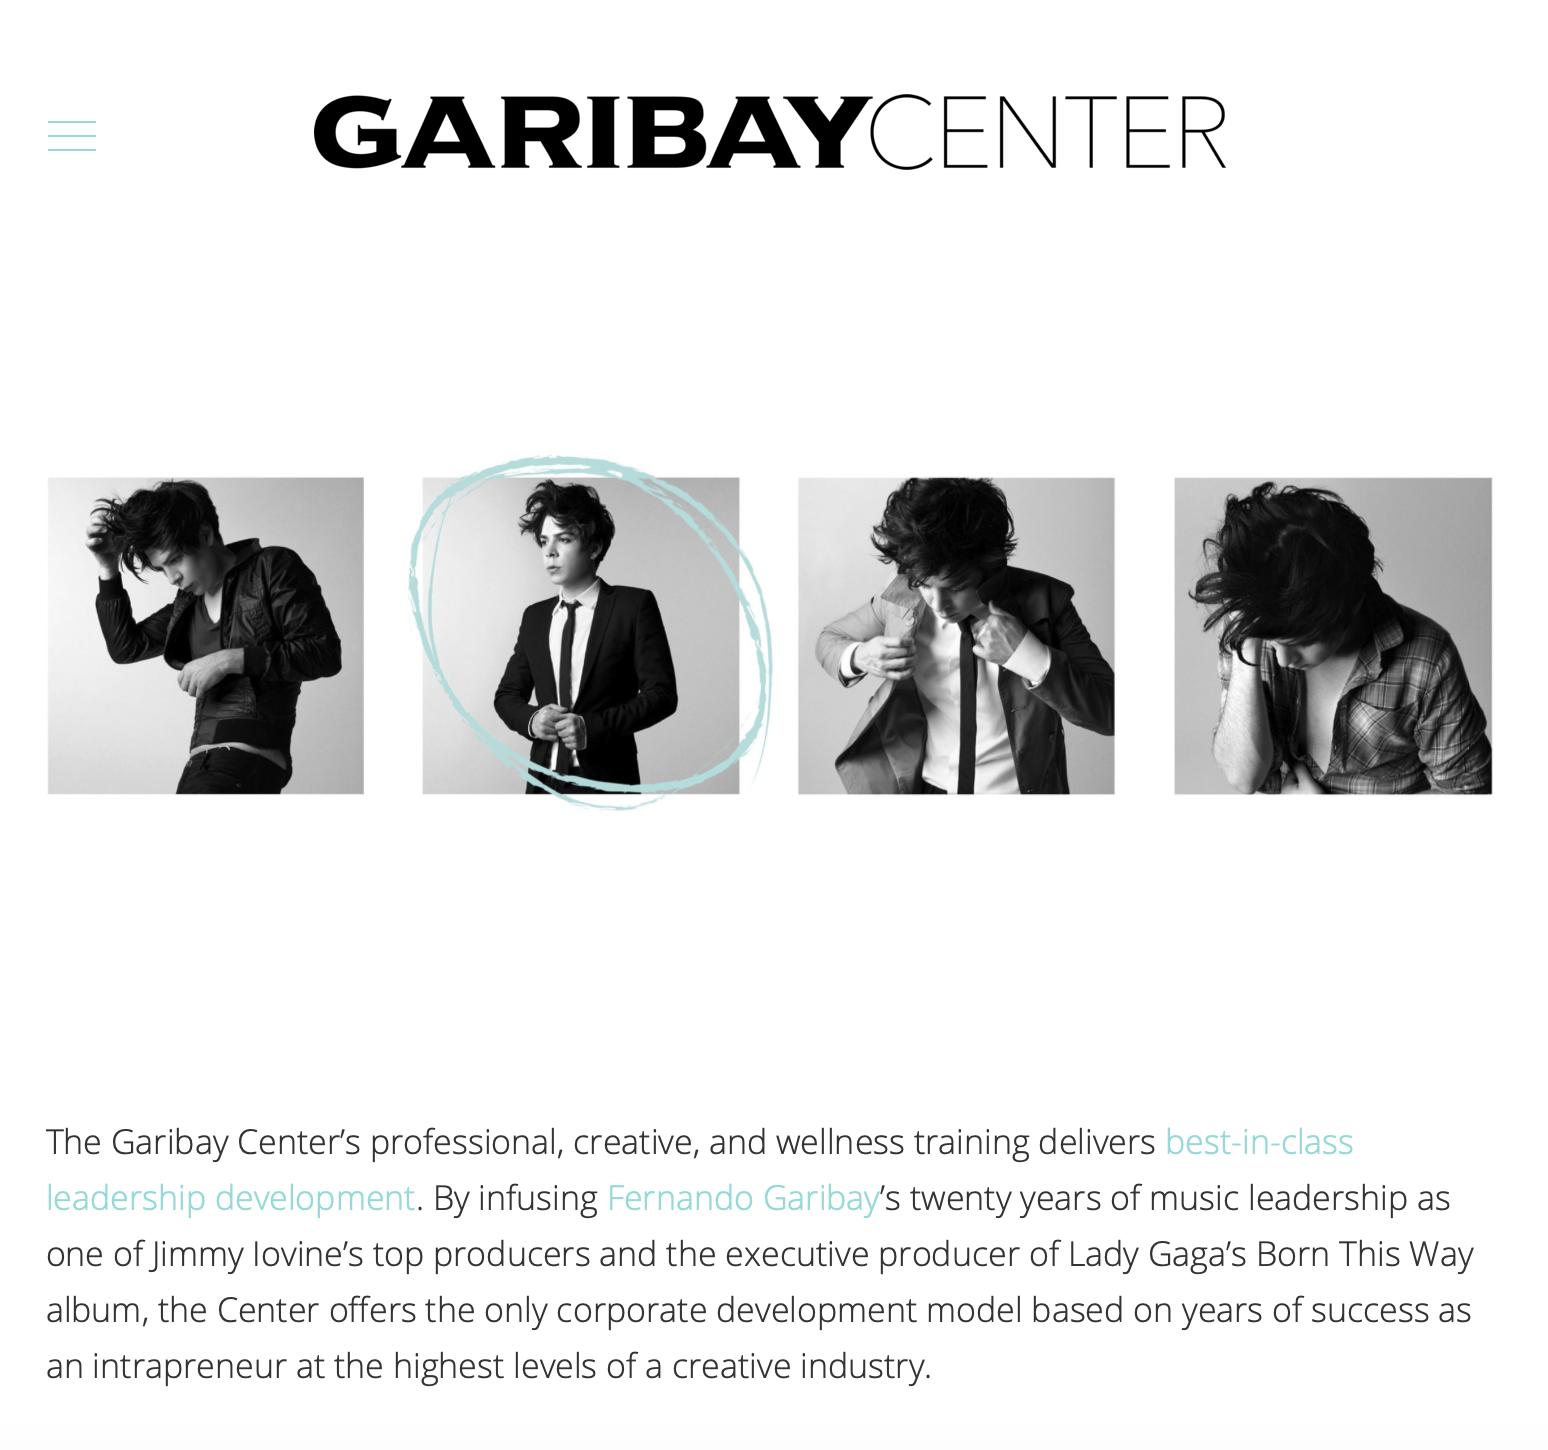 The Garibay Center